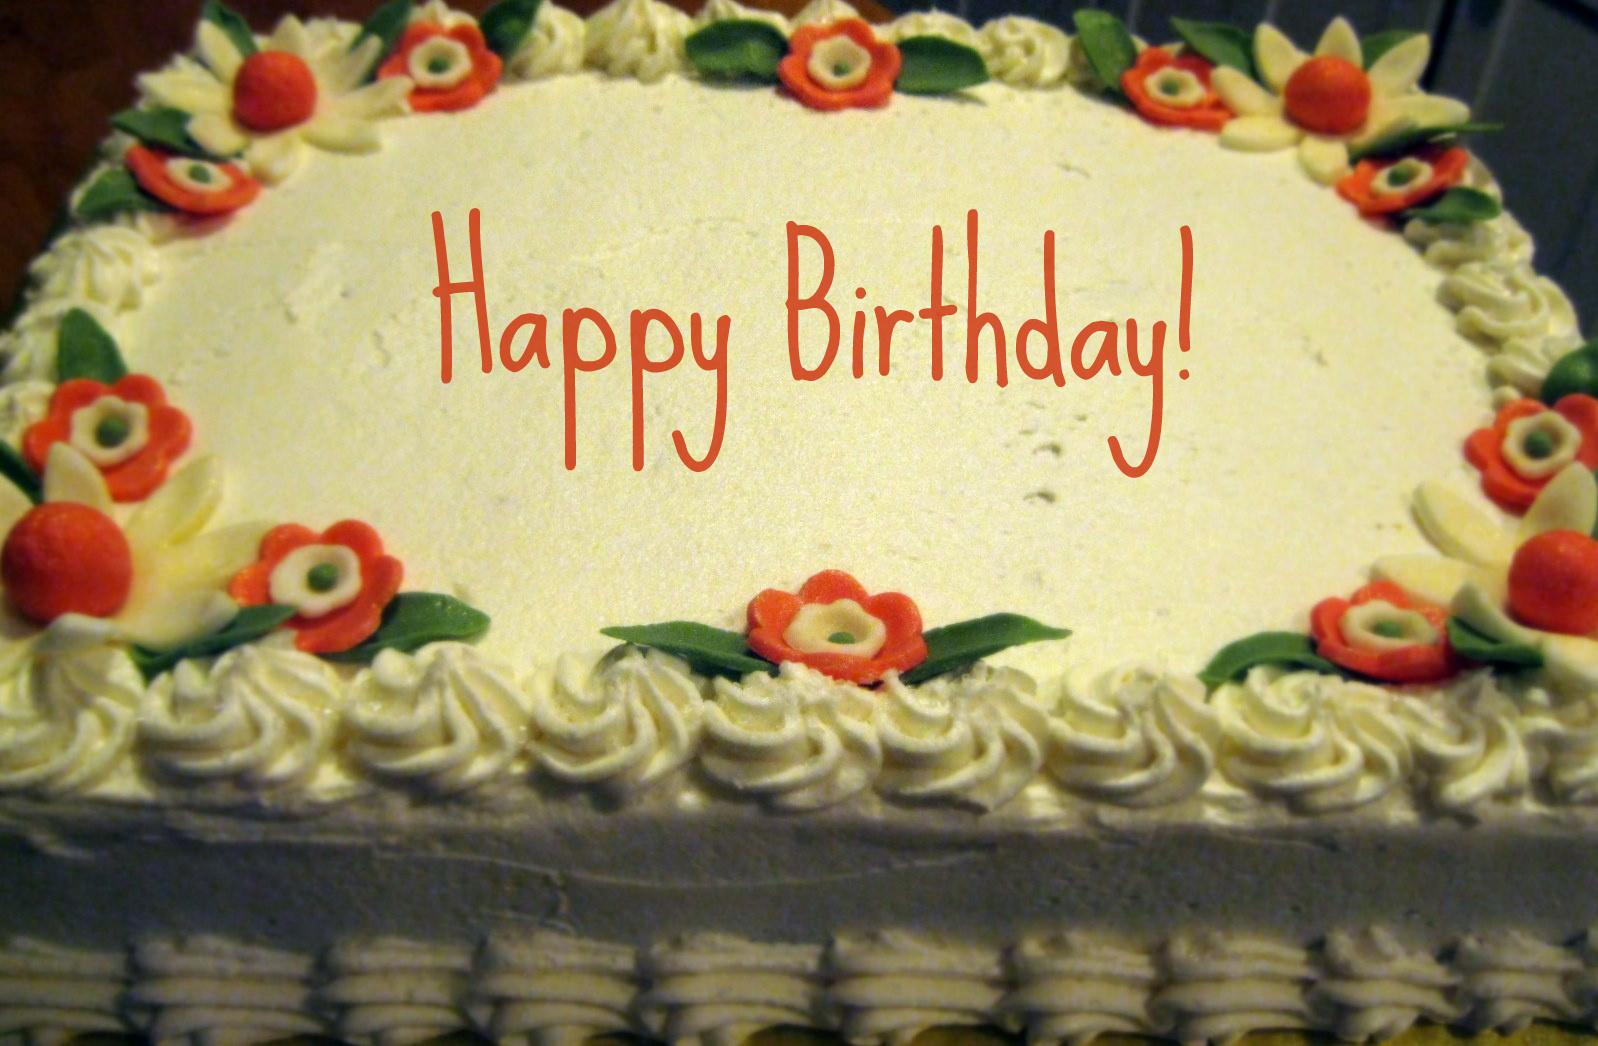 Happy Birthday Women Friends My friend joanne's father,